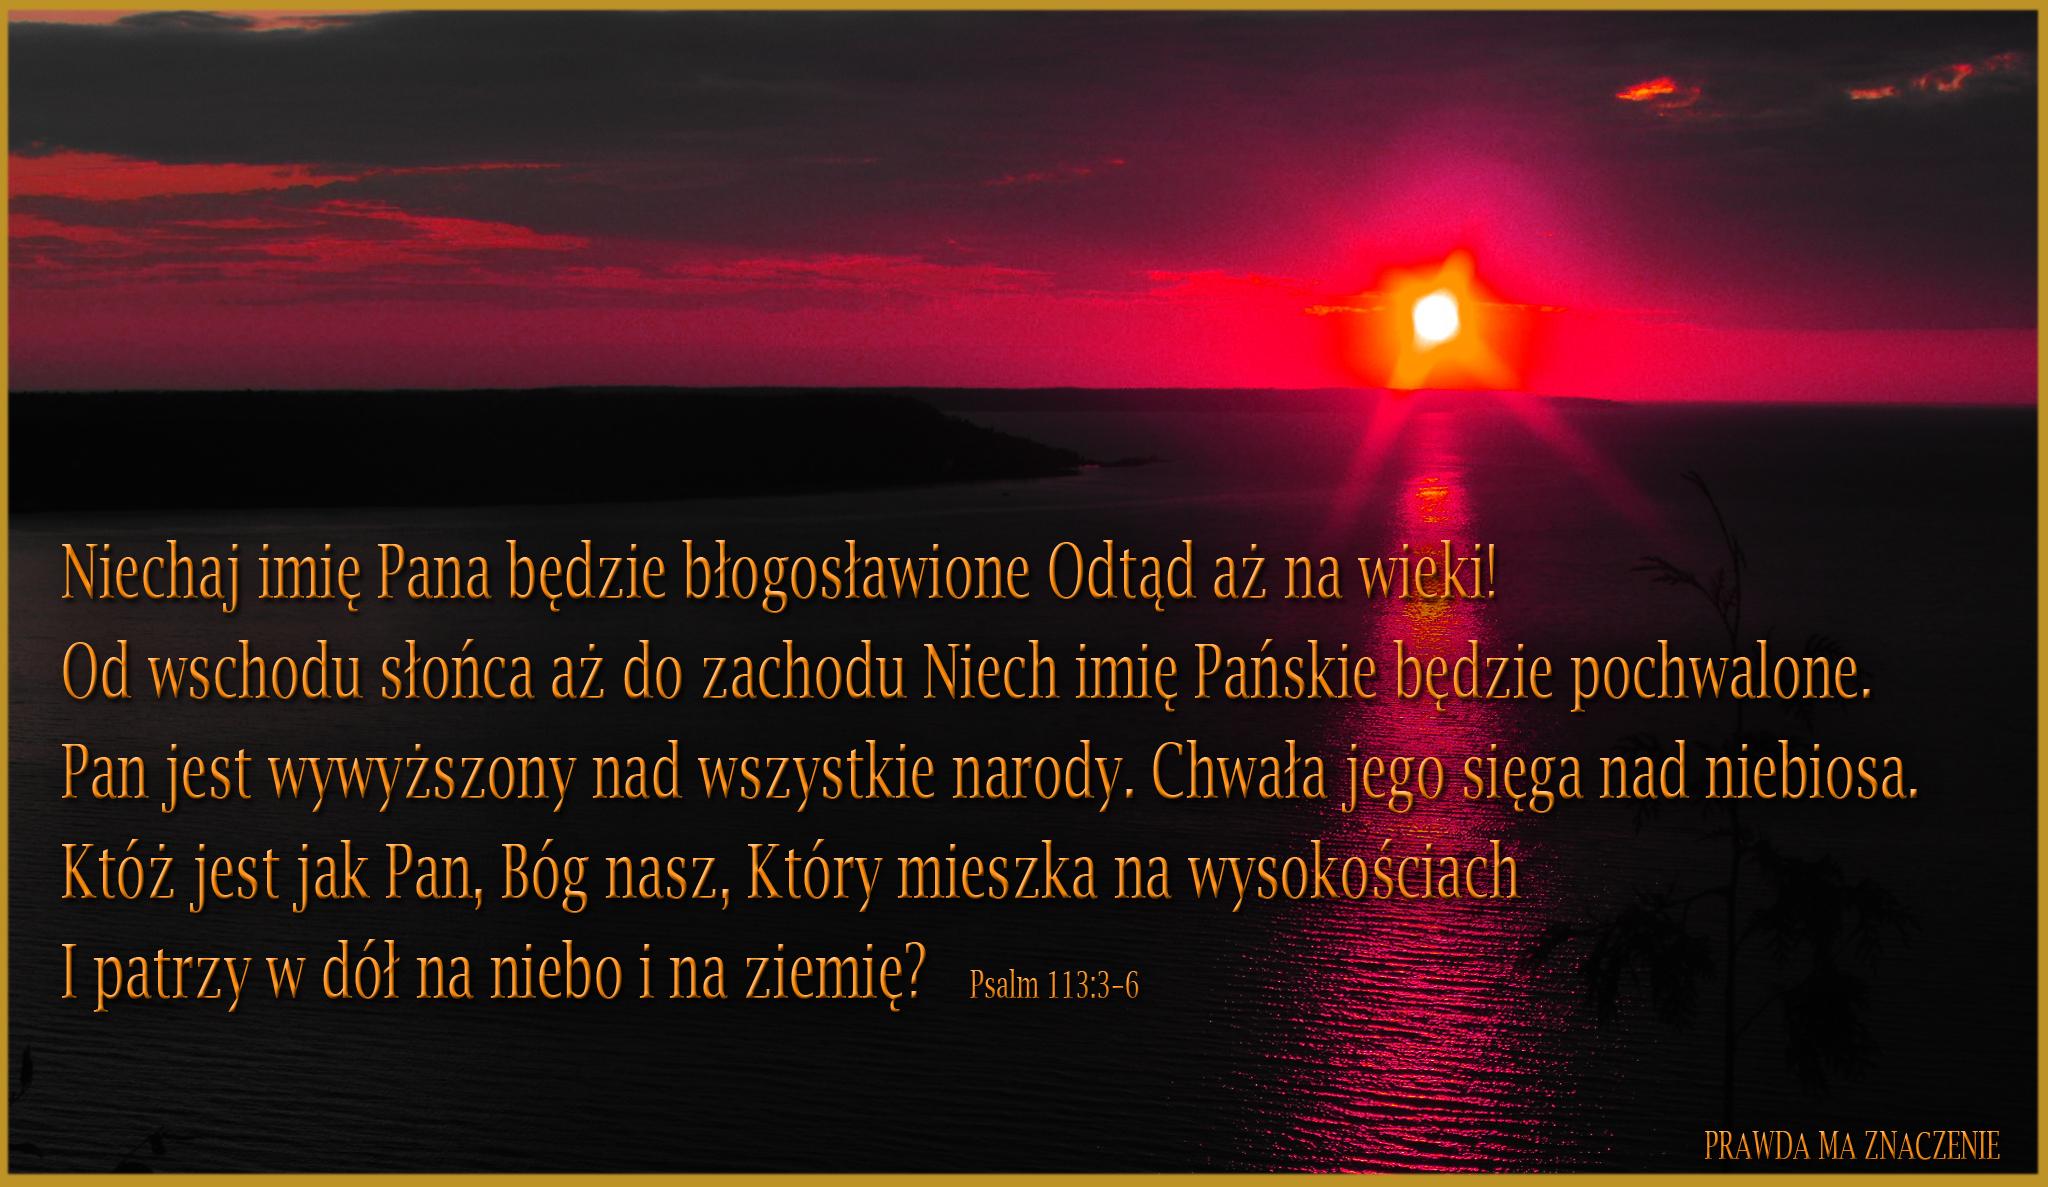 psalm 113 3 6